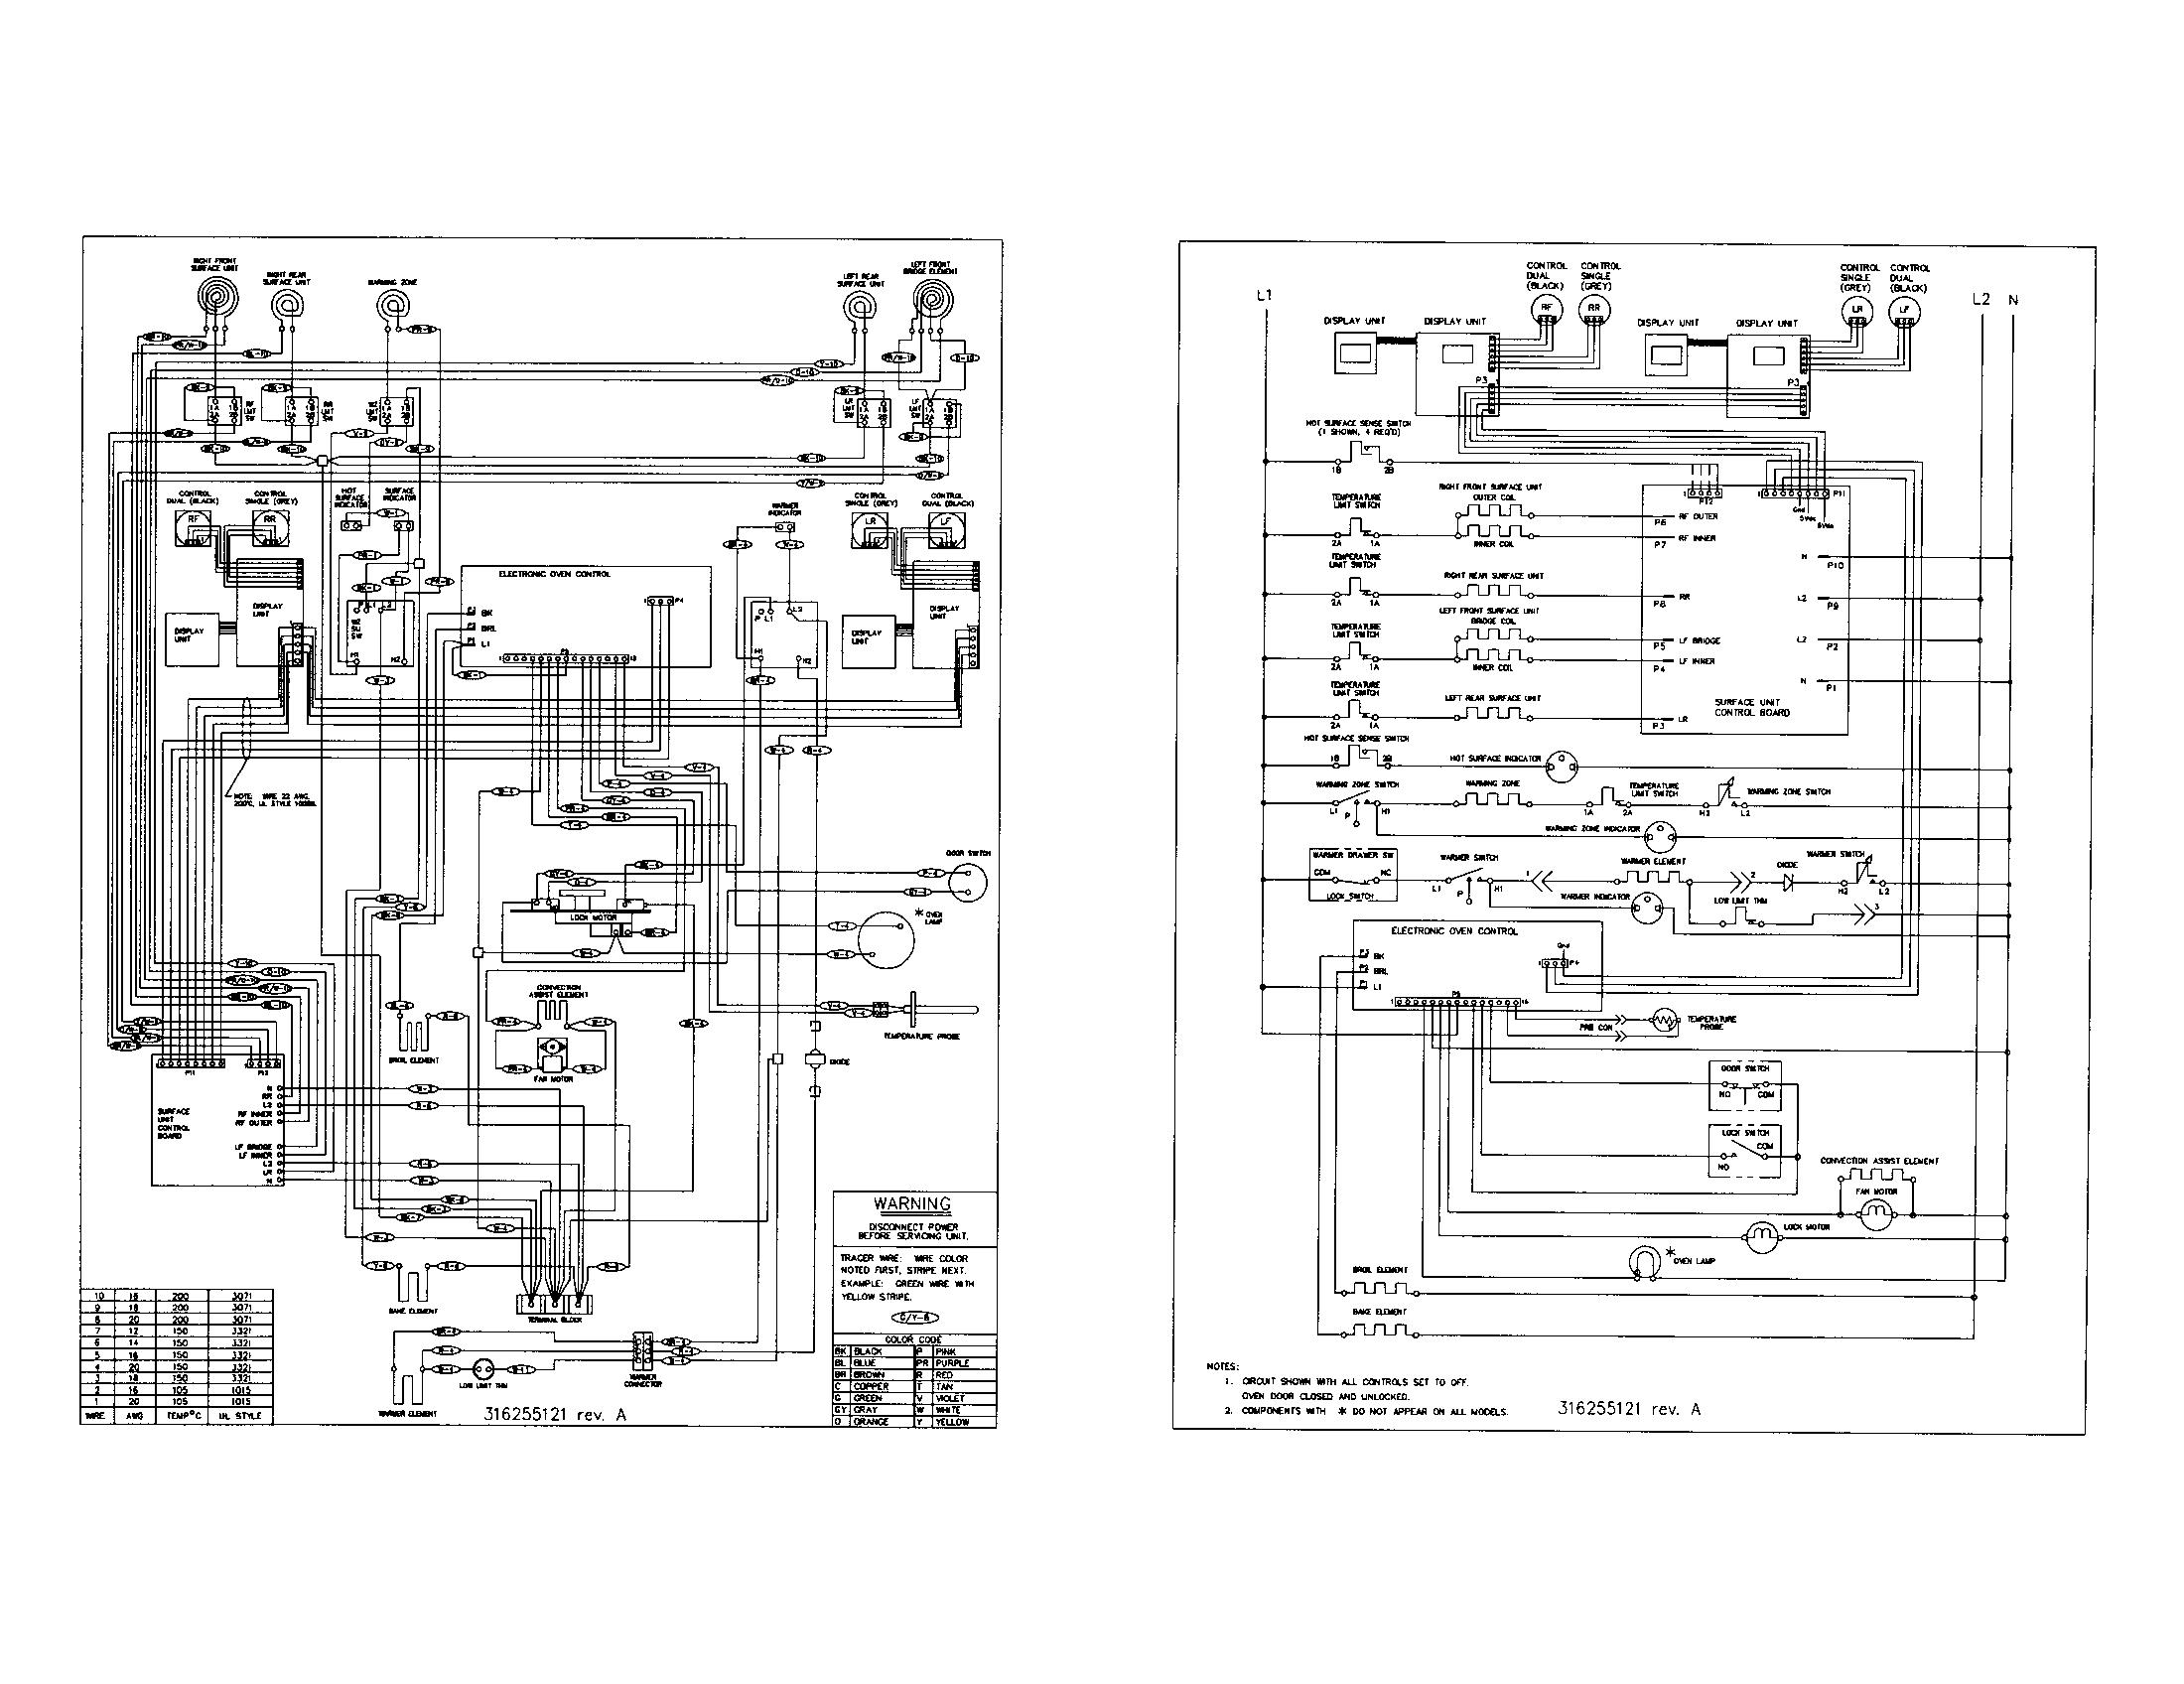 wiring diagram parts?resize\\\\\\\\\\\\\\\\\\\\\\\\\\\\\\\\\\\\\\\\\\\\\\\\\\\=665%2C513 plasma cutter wiring diagram wiring diagram shrutiradio zeny cut50 wiring diagram at soozxer.org